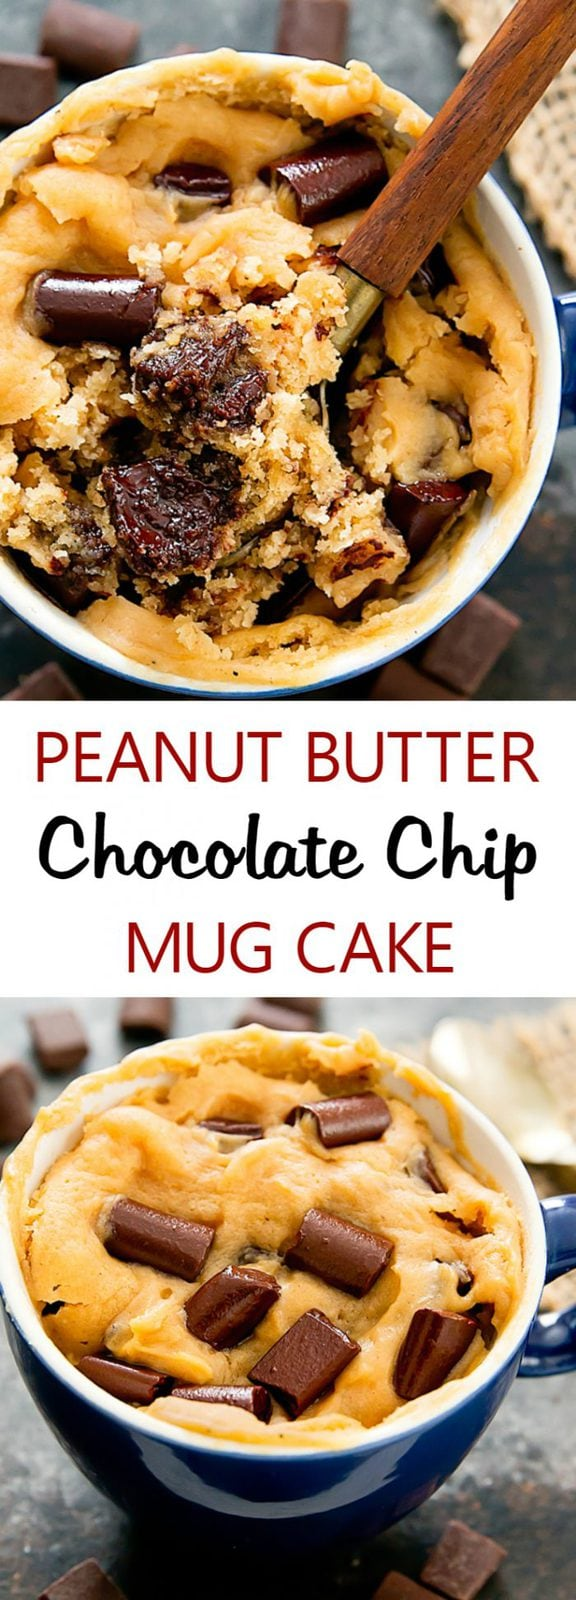 Peanut Butter Chocolate Chip Mug Cake Kirbie S Cravings